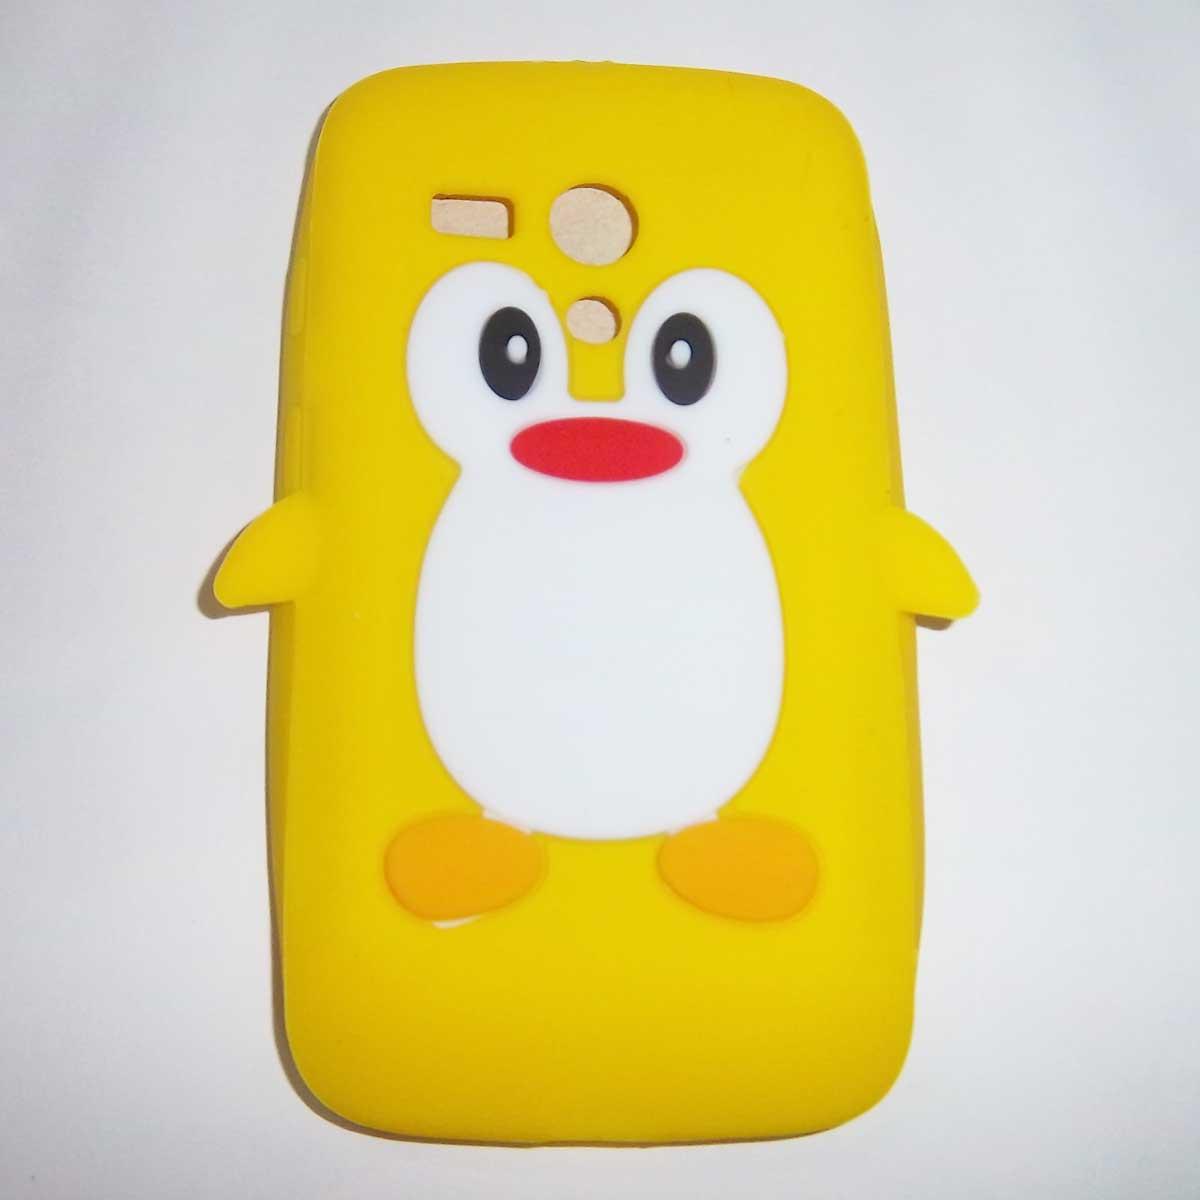 Yellow Silicon Penguin Back Cover Case For Motorola Moto G XT1031 / XT1032